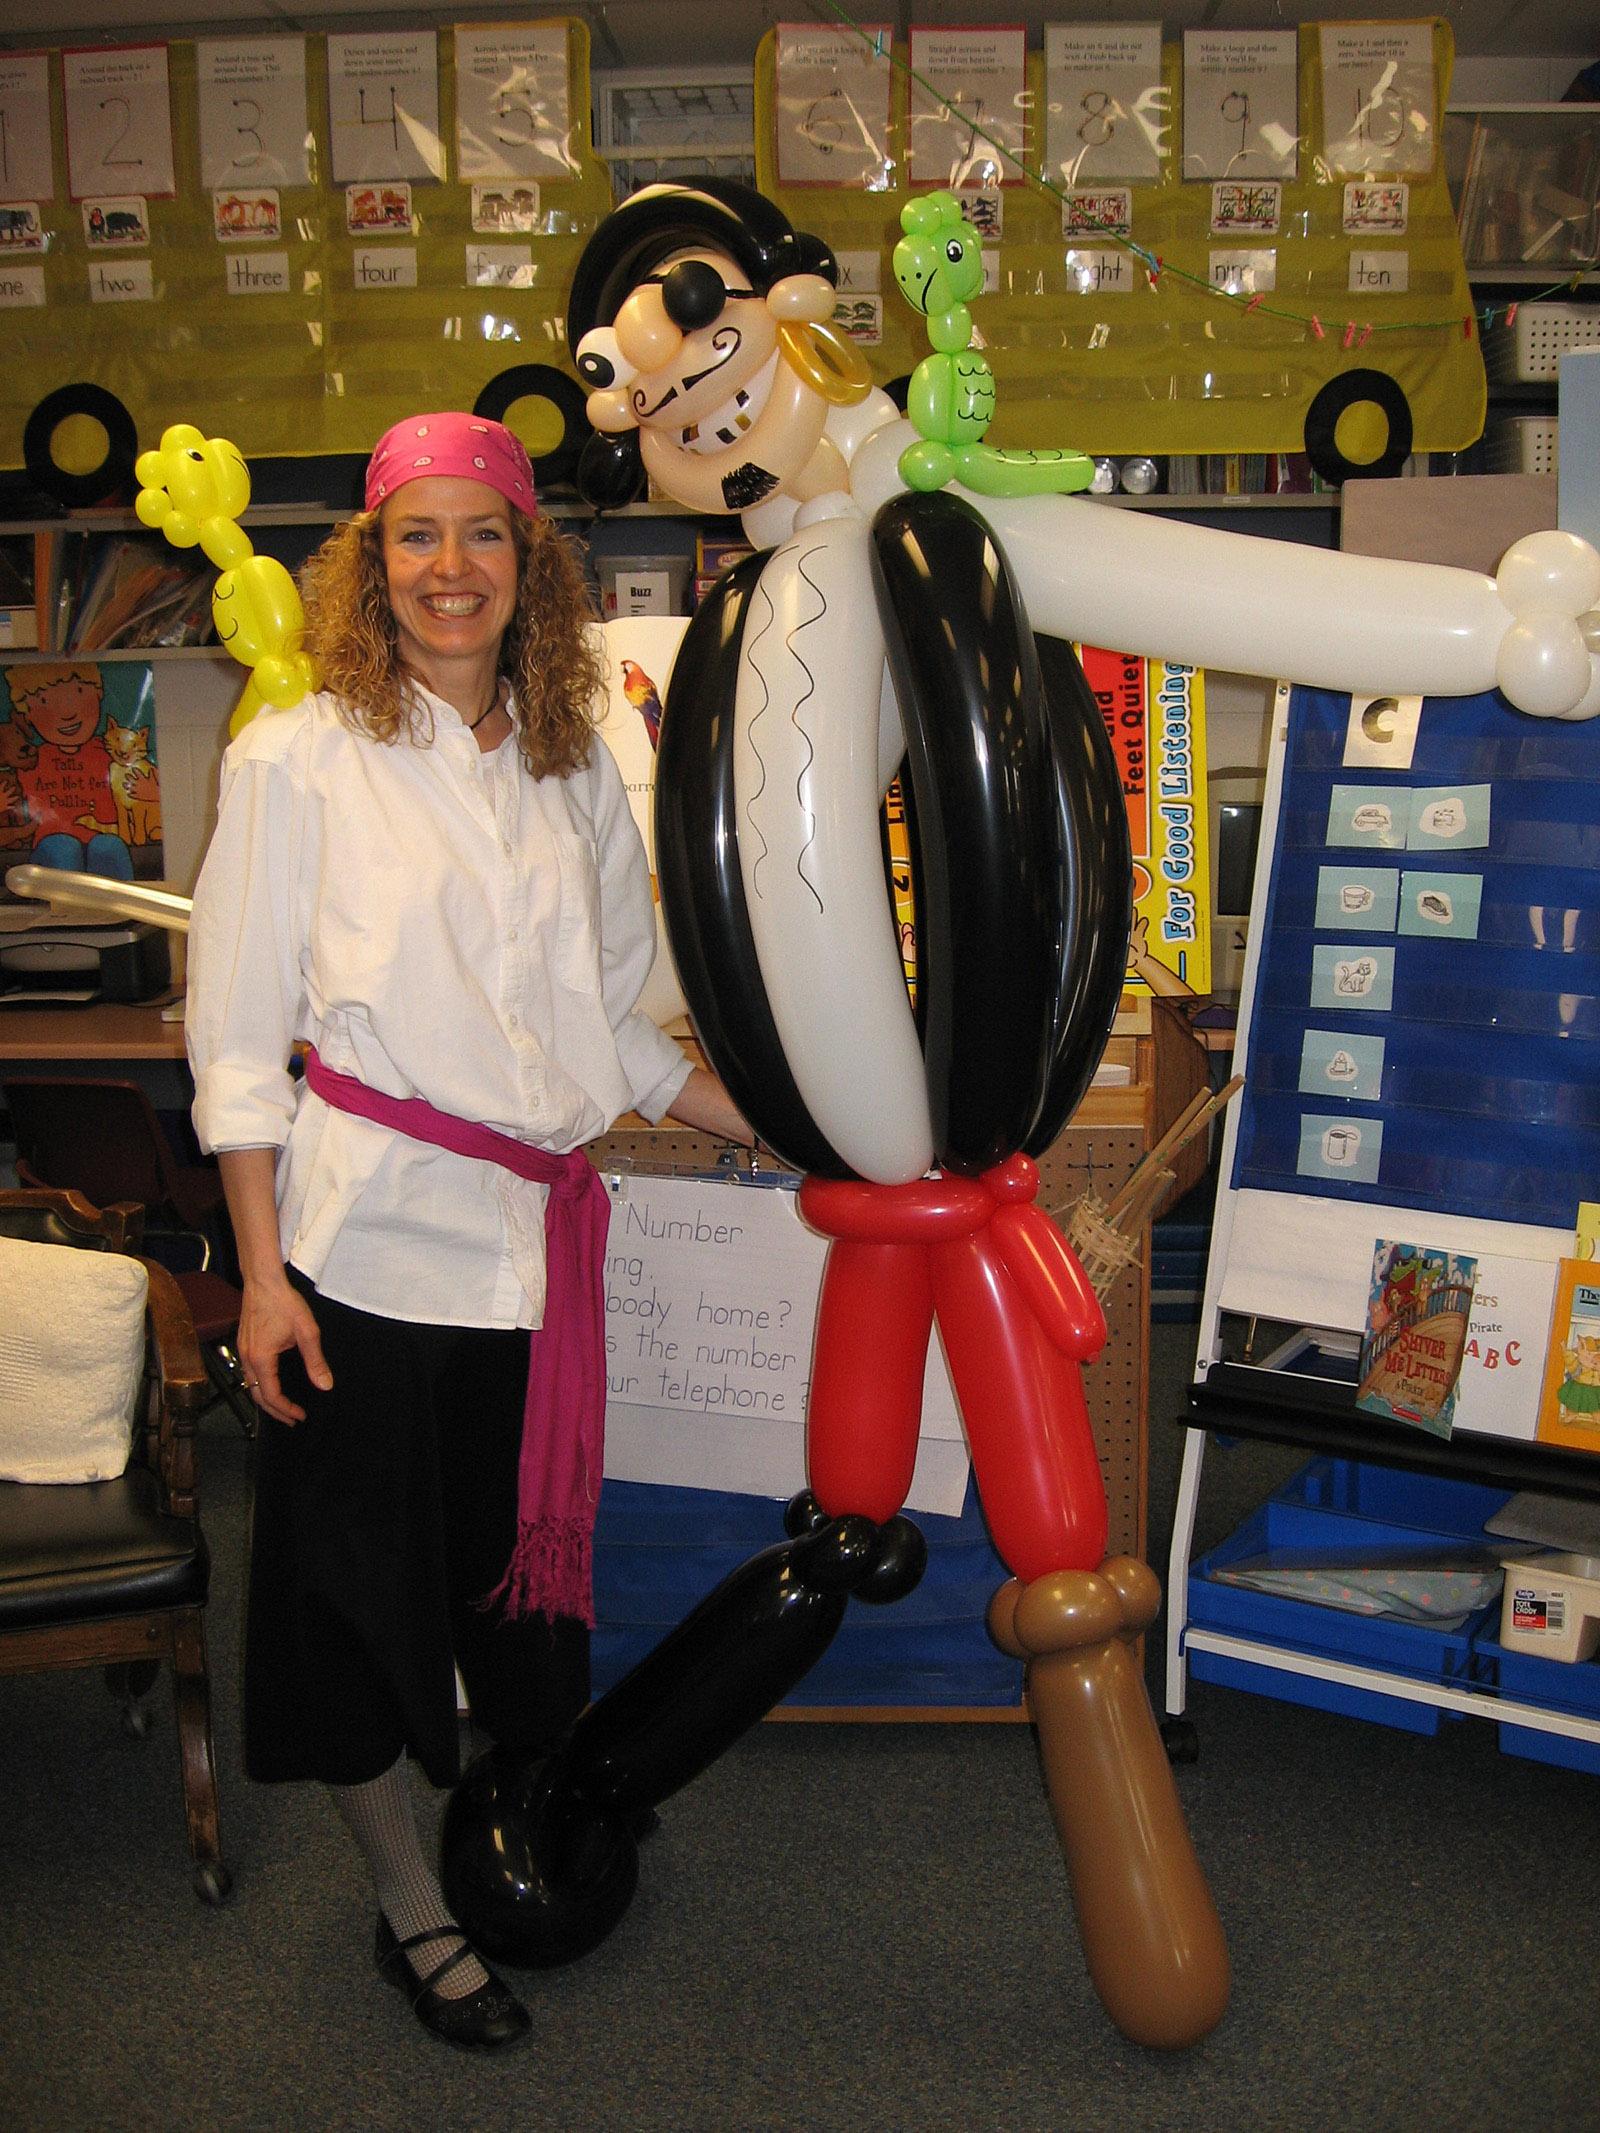 Balloon Pirate